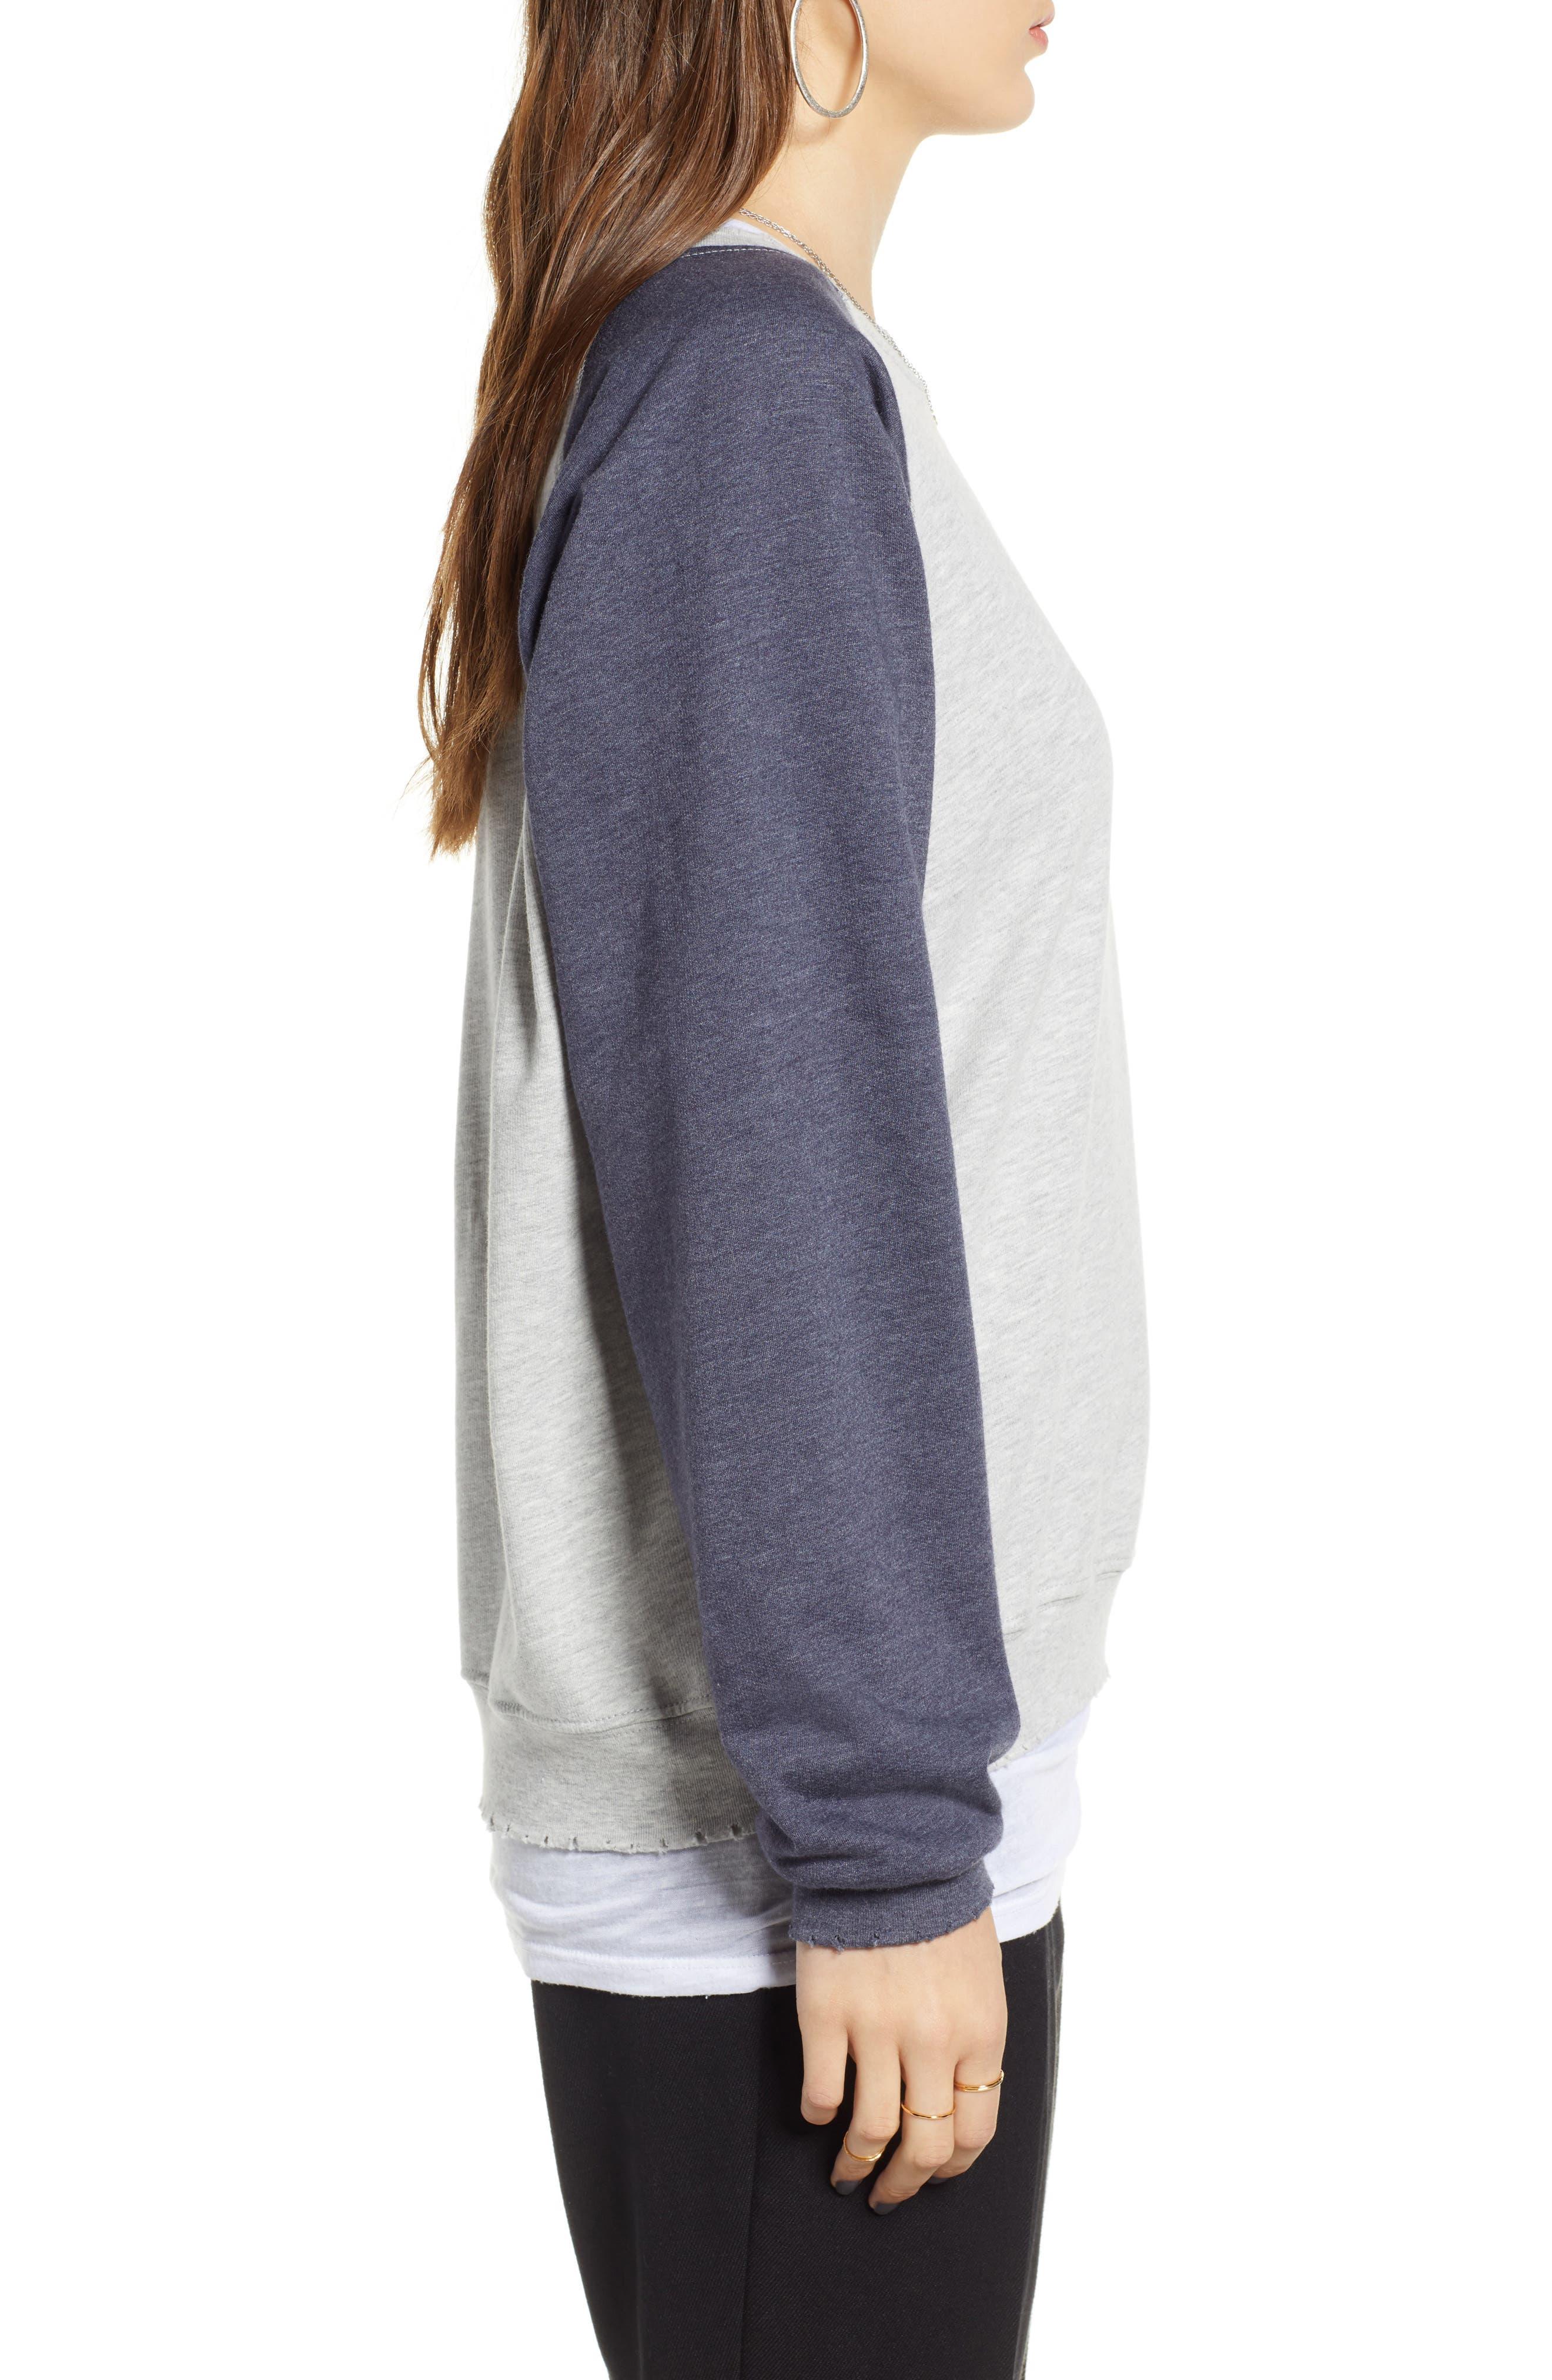 Raglan Sweatshirt,                             Alternate thumbnail 3, color,                             GREY HEATHER- NAVY COMBO